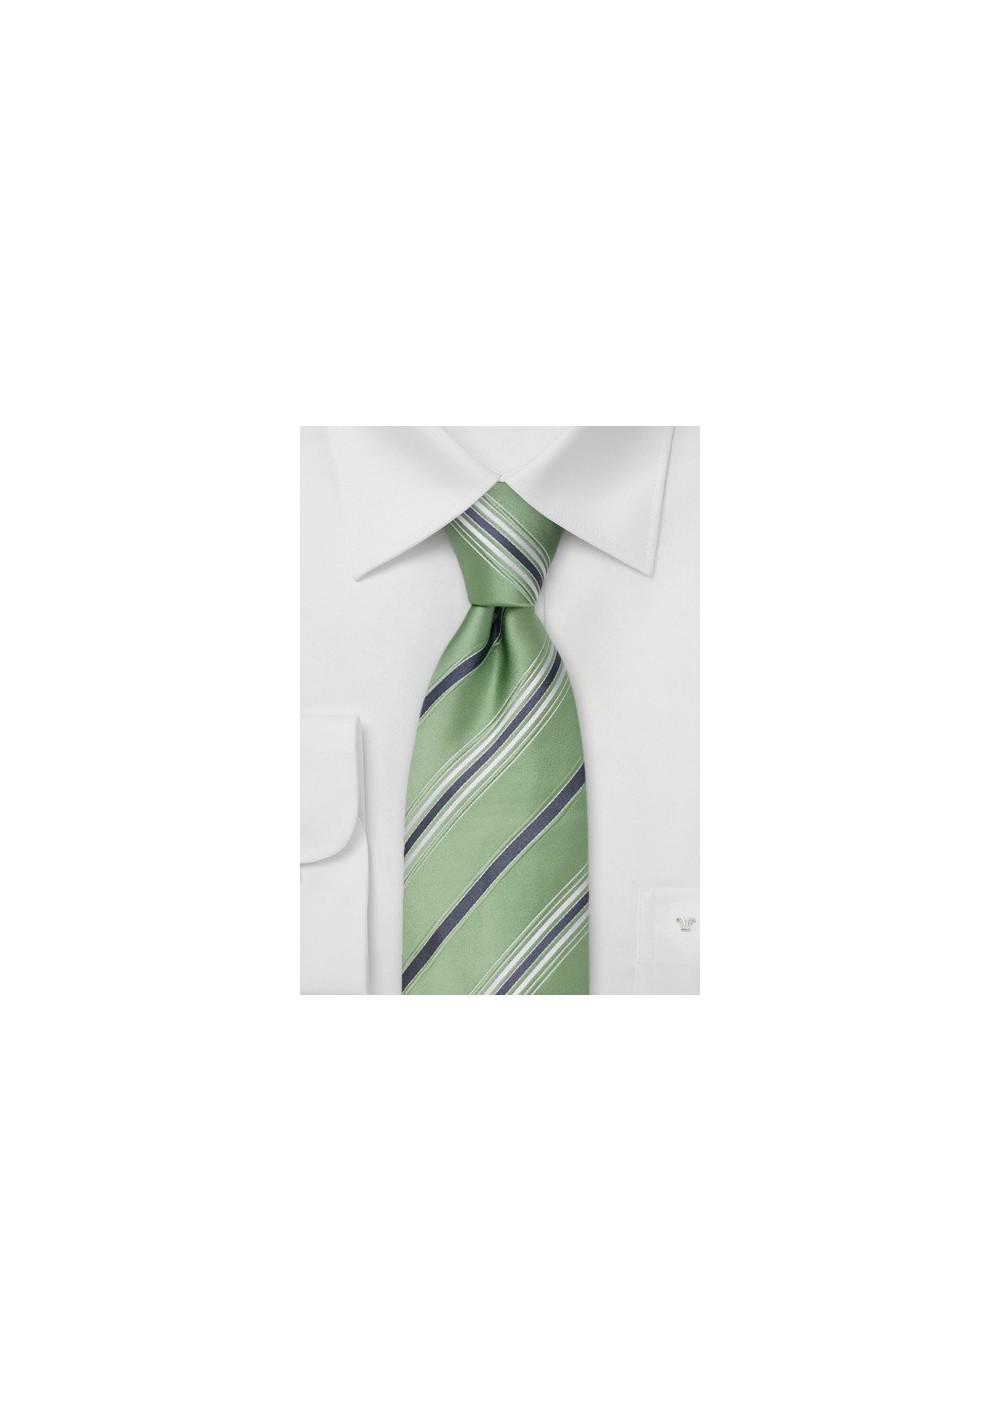 Mint Green Silk Ties - Green Designer Tie by Cavallieri